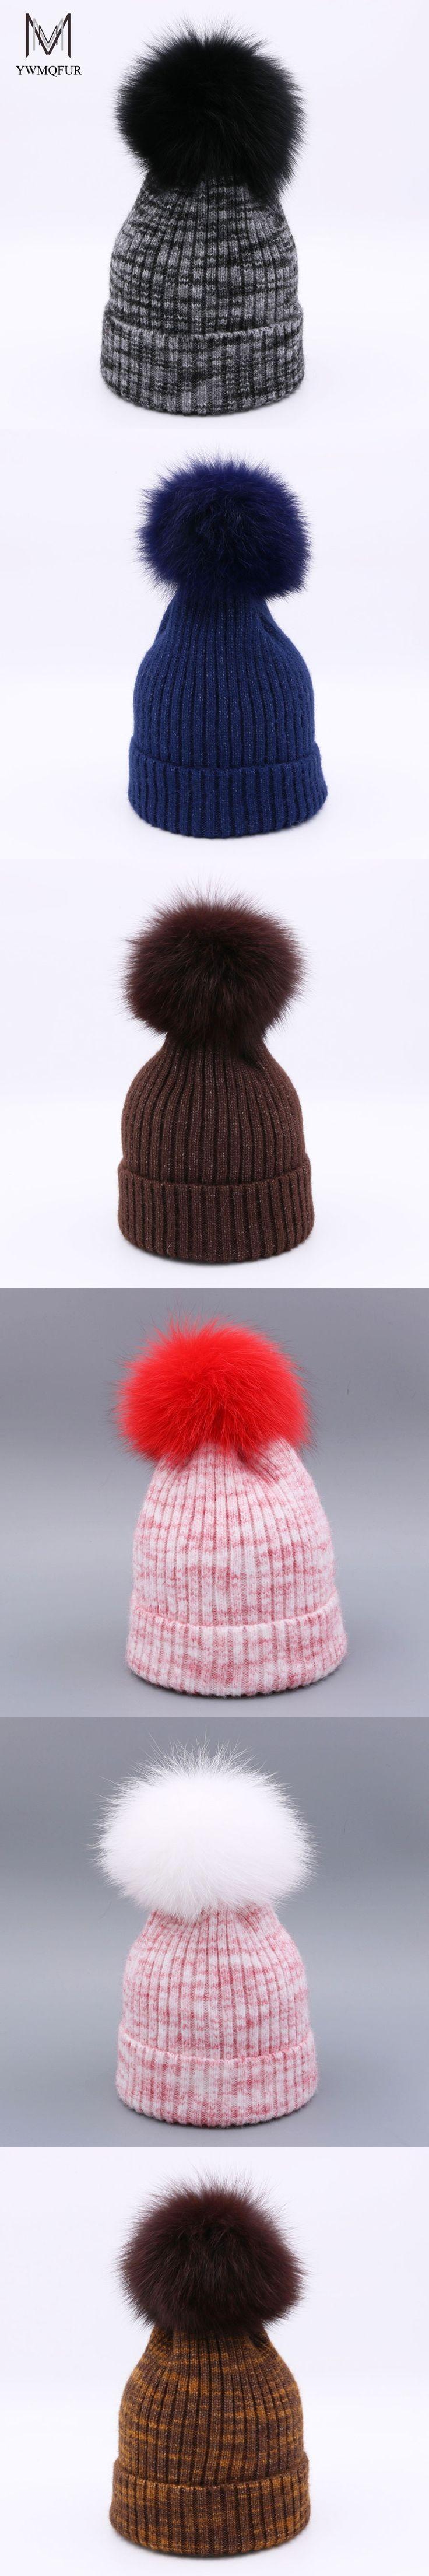 YWMQFUR Winter Wool Fur Beanies Female Warm Knitted Hats Genuine Natural Fox Fur Wool Hat Fashion Women Pompon Caps gorros H110